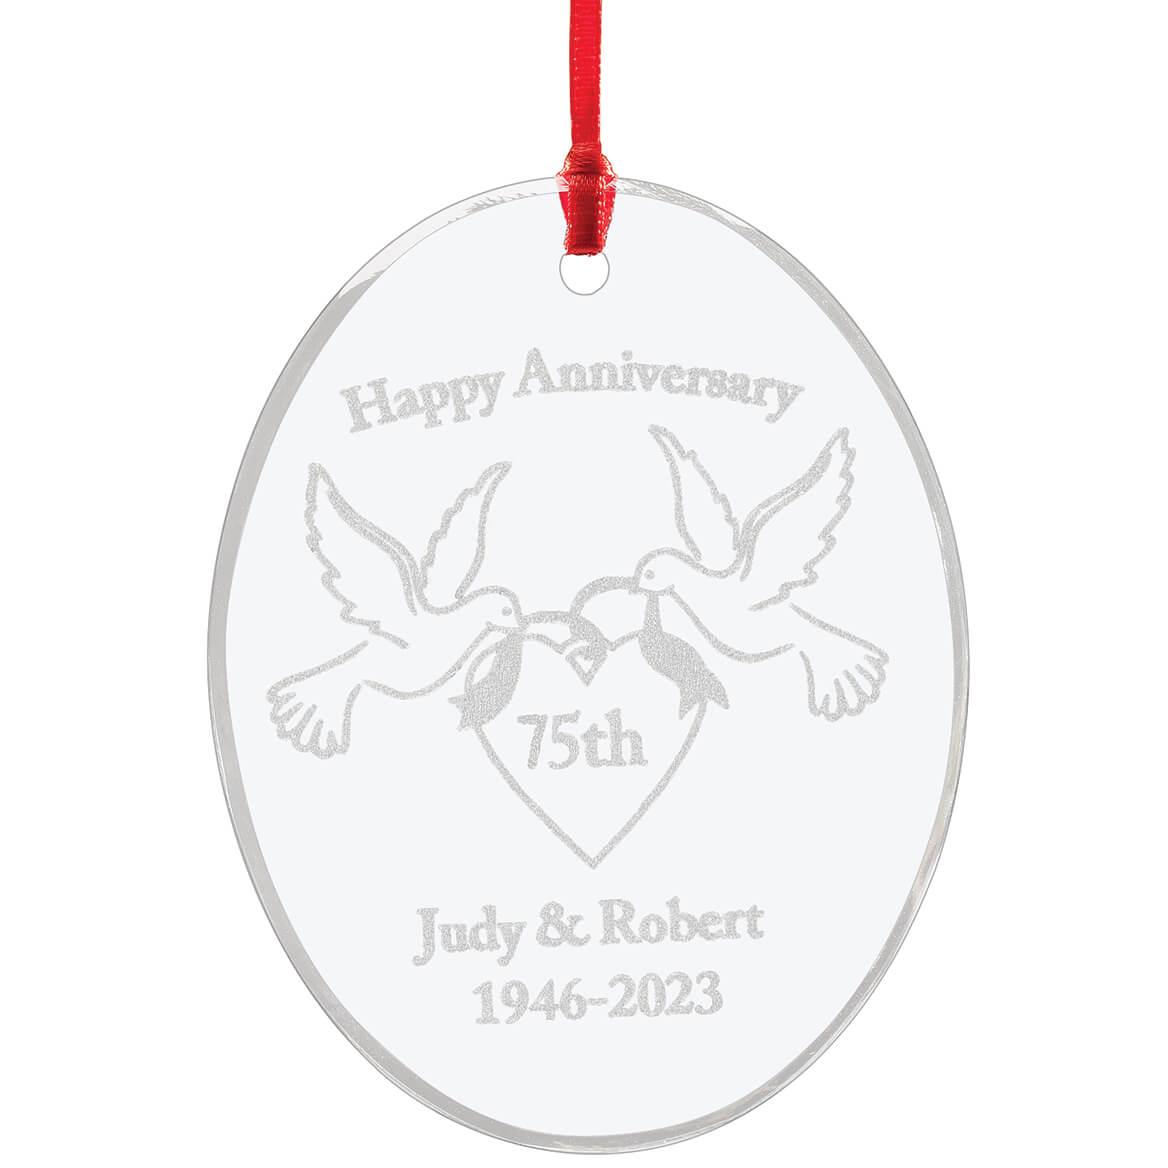 Personalized Glass Anniversary Ornament-349936